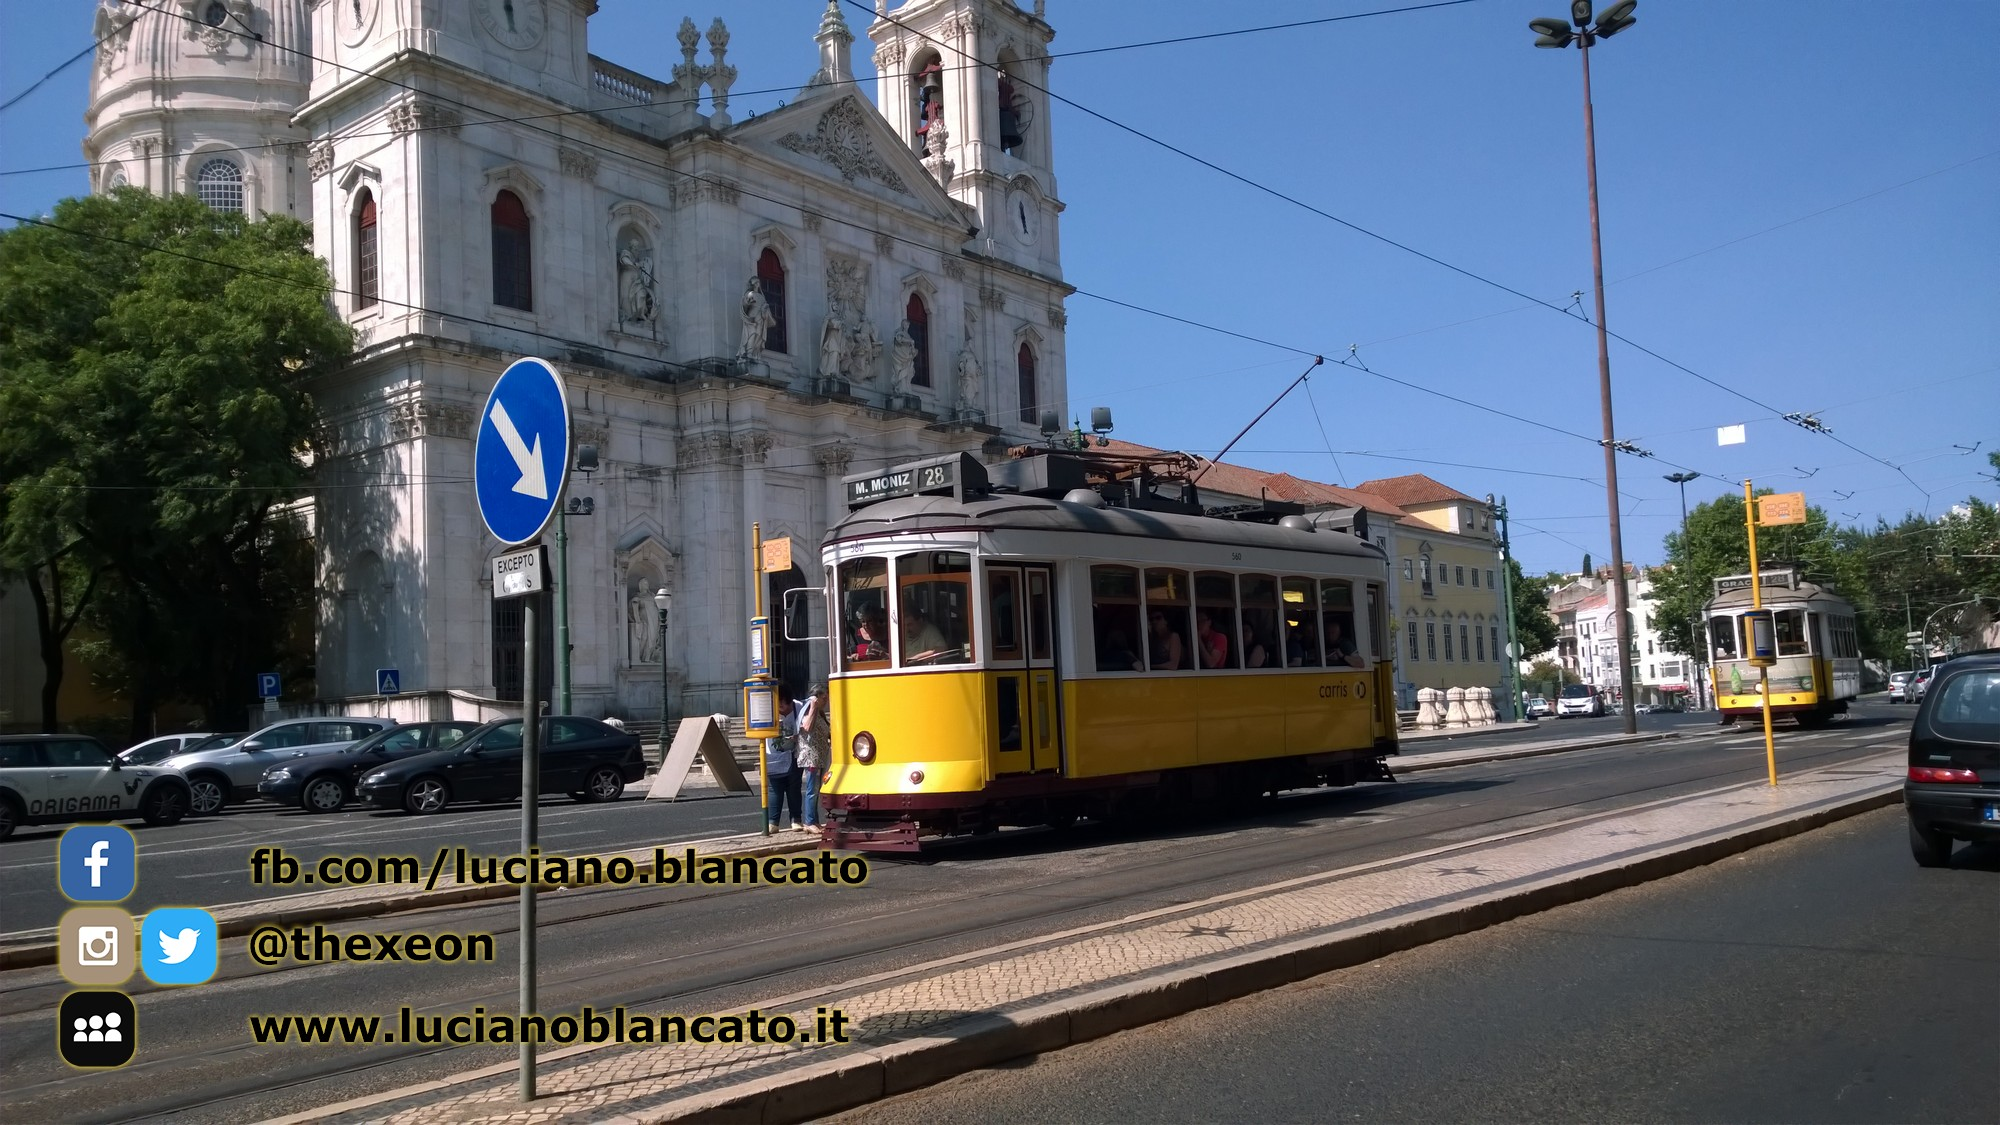 copy_Lisbona - in giro per la città! fermata del tram